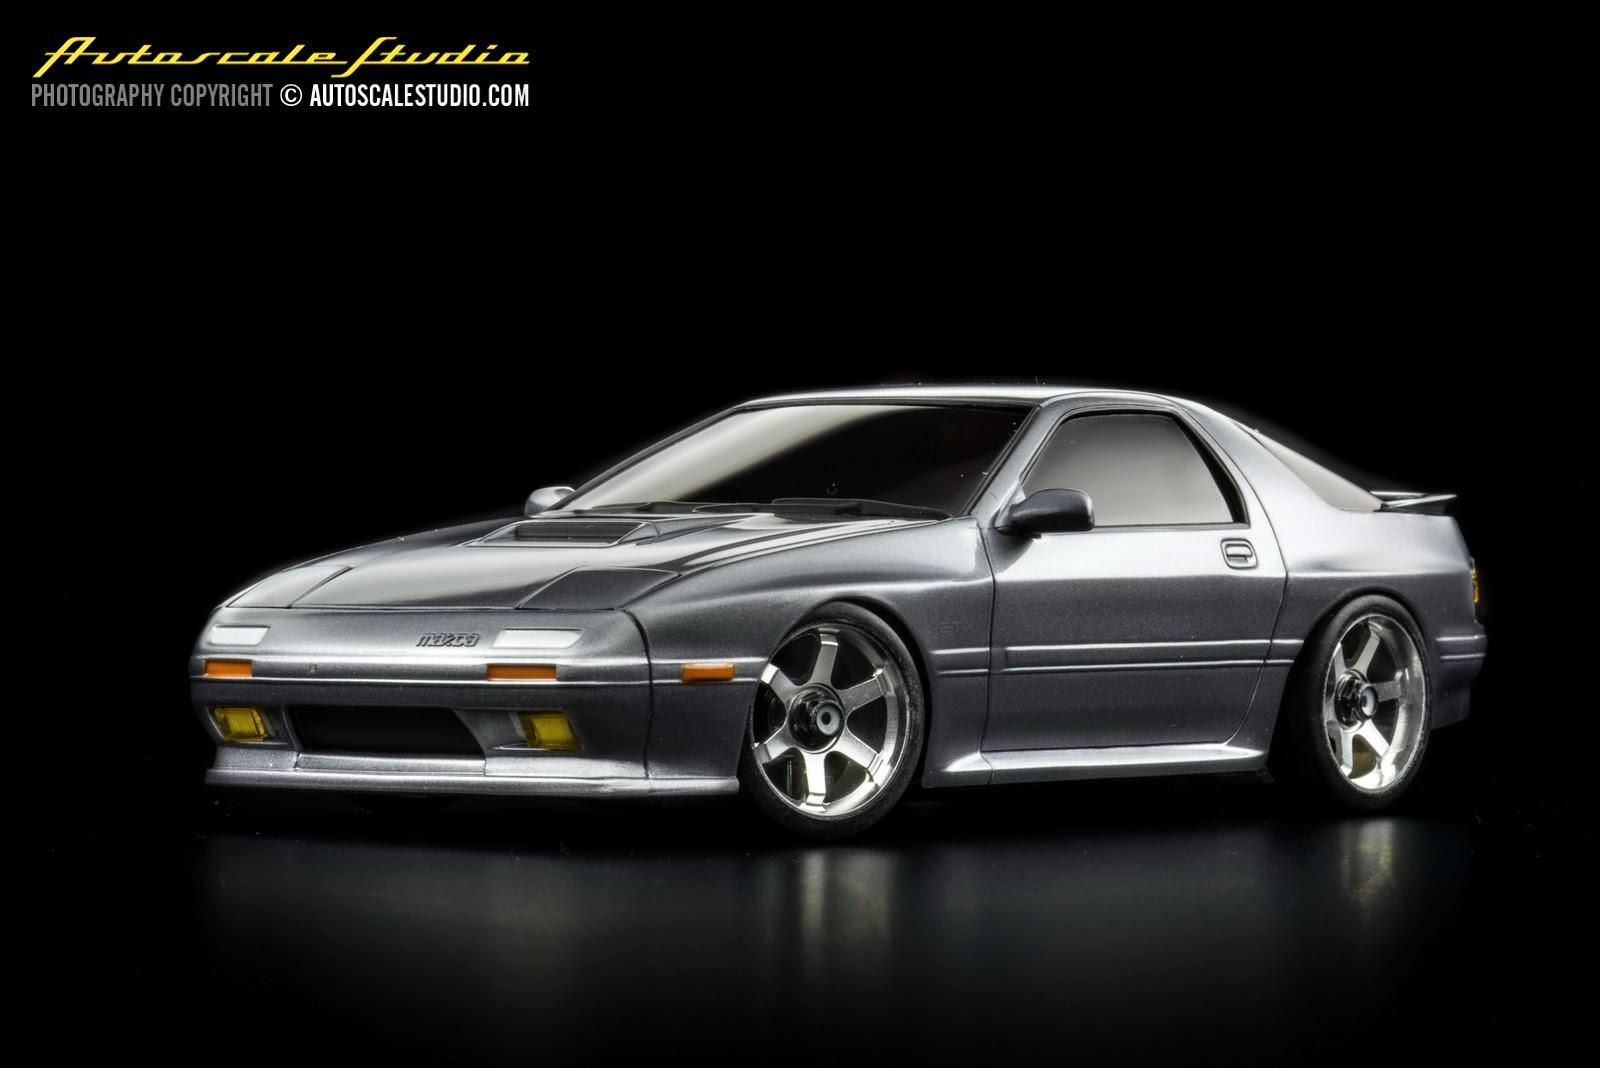 Mzp17gm Mazda Rx 7 Fc3s Gun Metallic Autoscale Studio オートスケール・スタジオ